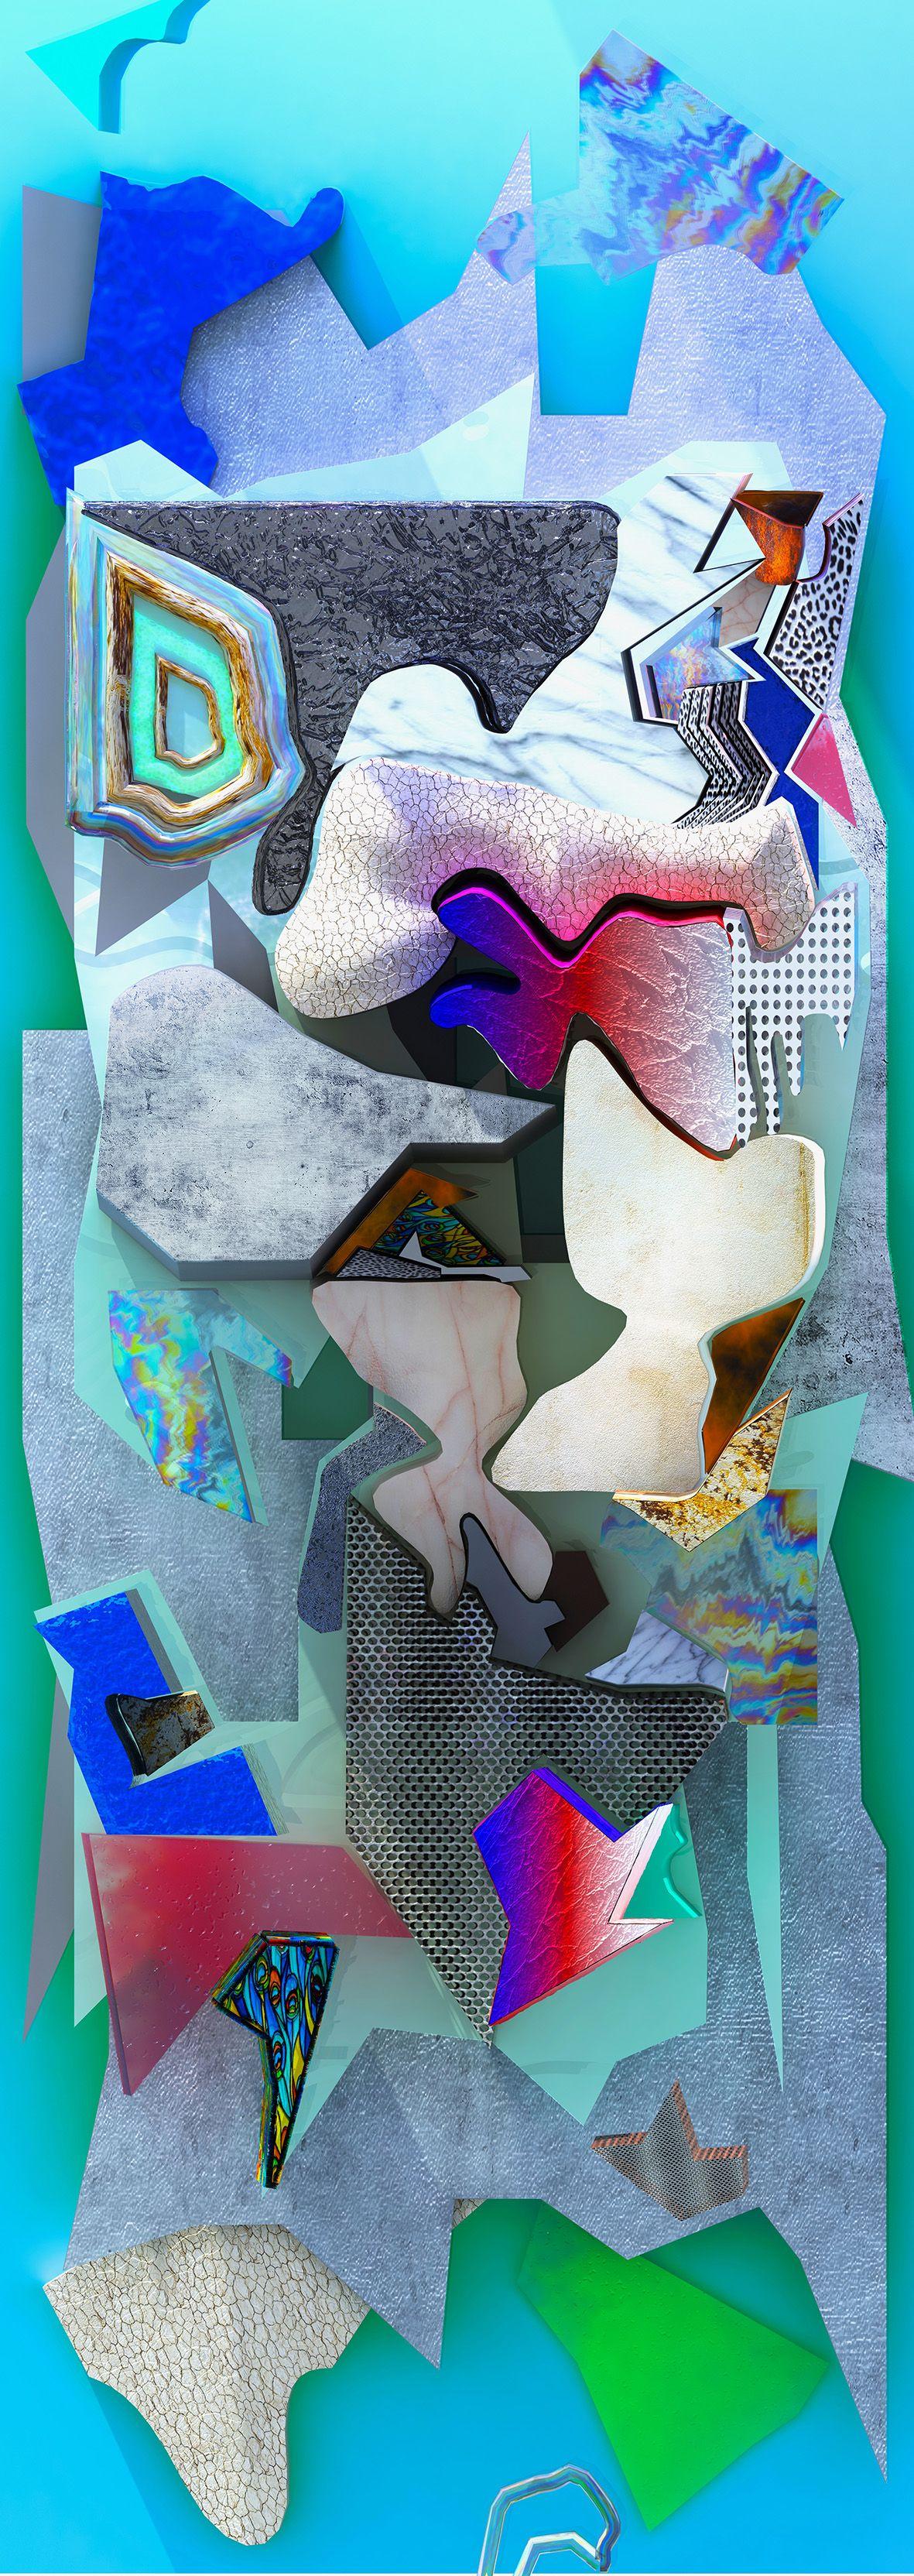 Eva-Papamargariti-Fake-Fragments-10x29-compressor.jpg